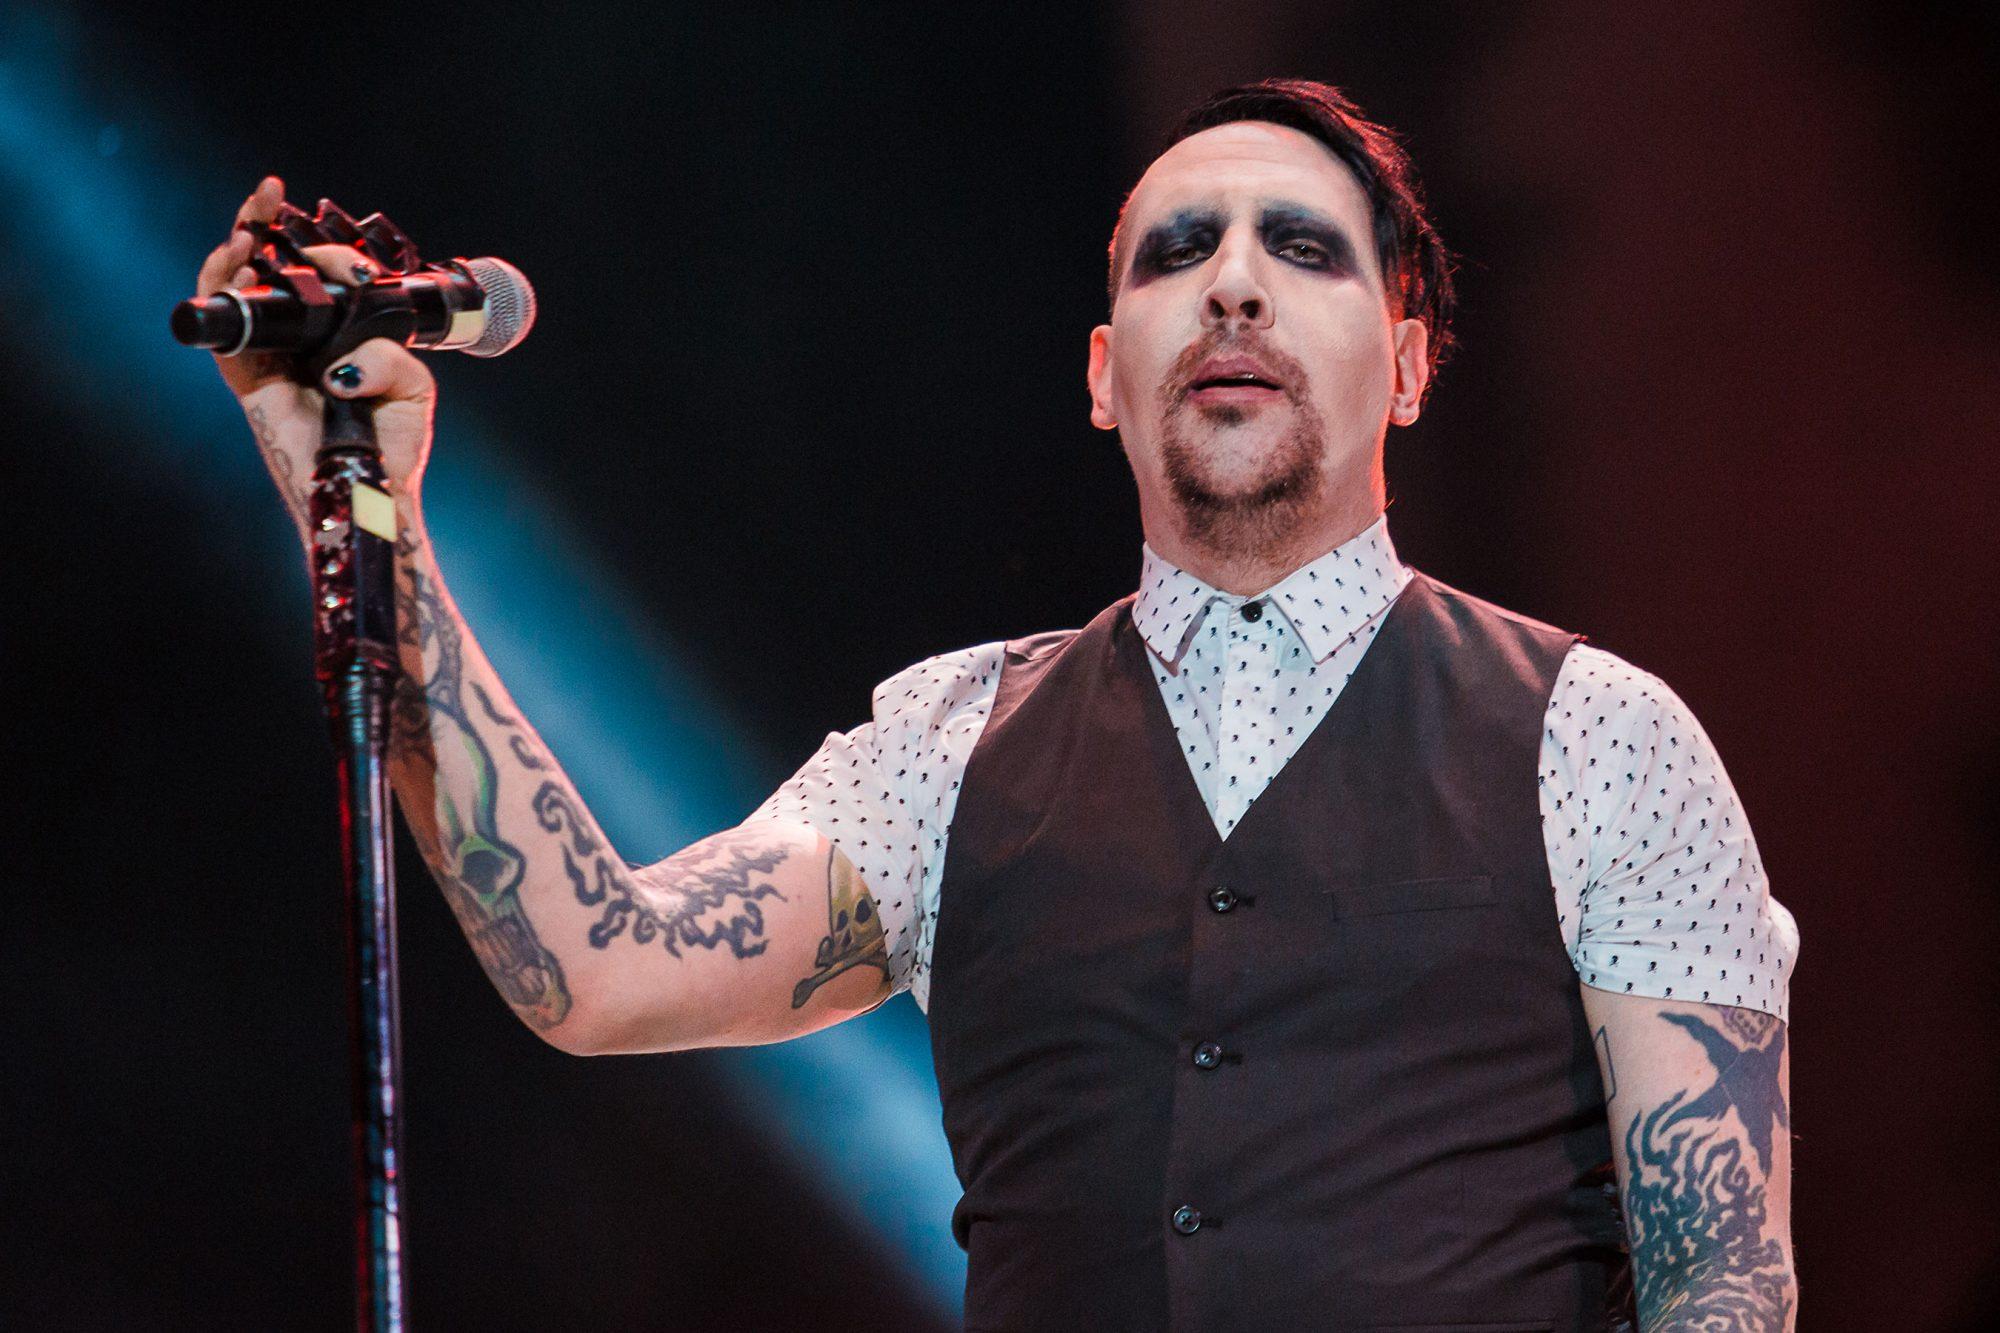 Maximus Festival Brazil - Marilyn Manson Concert